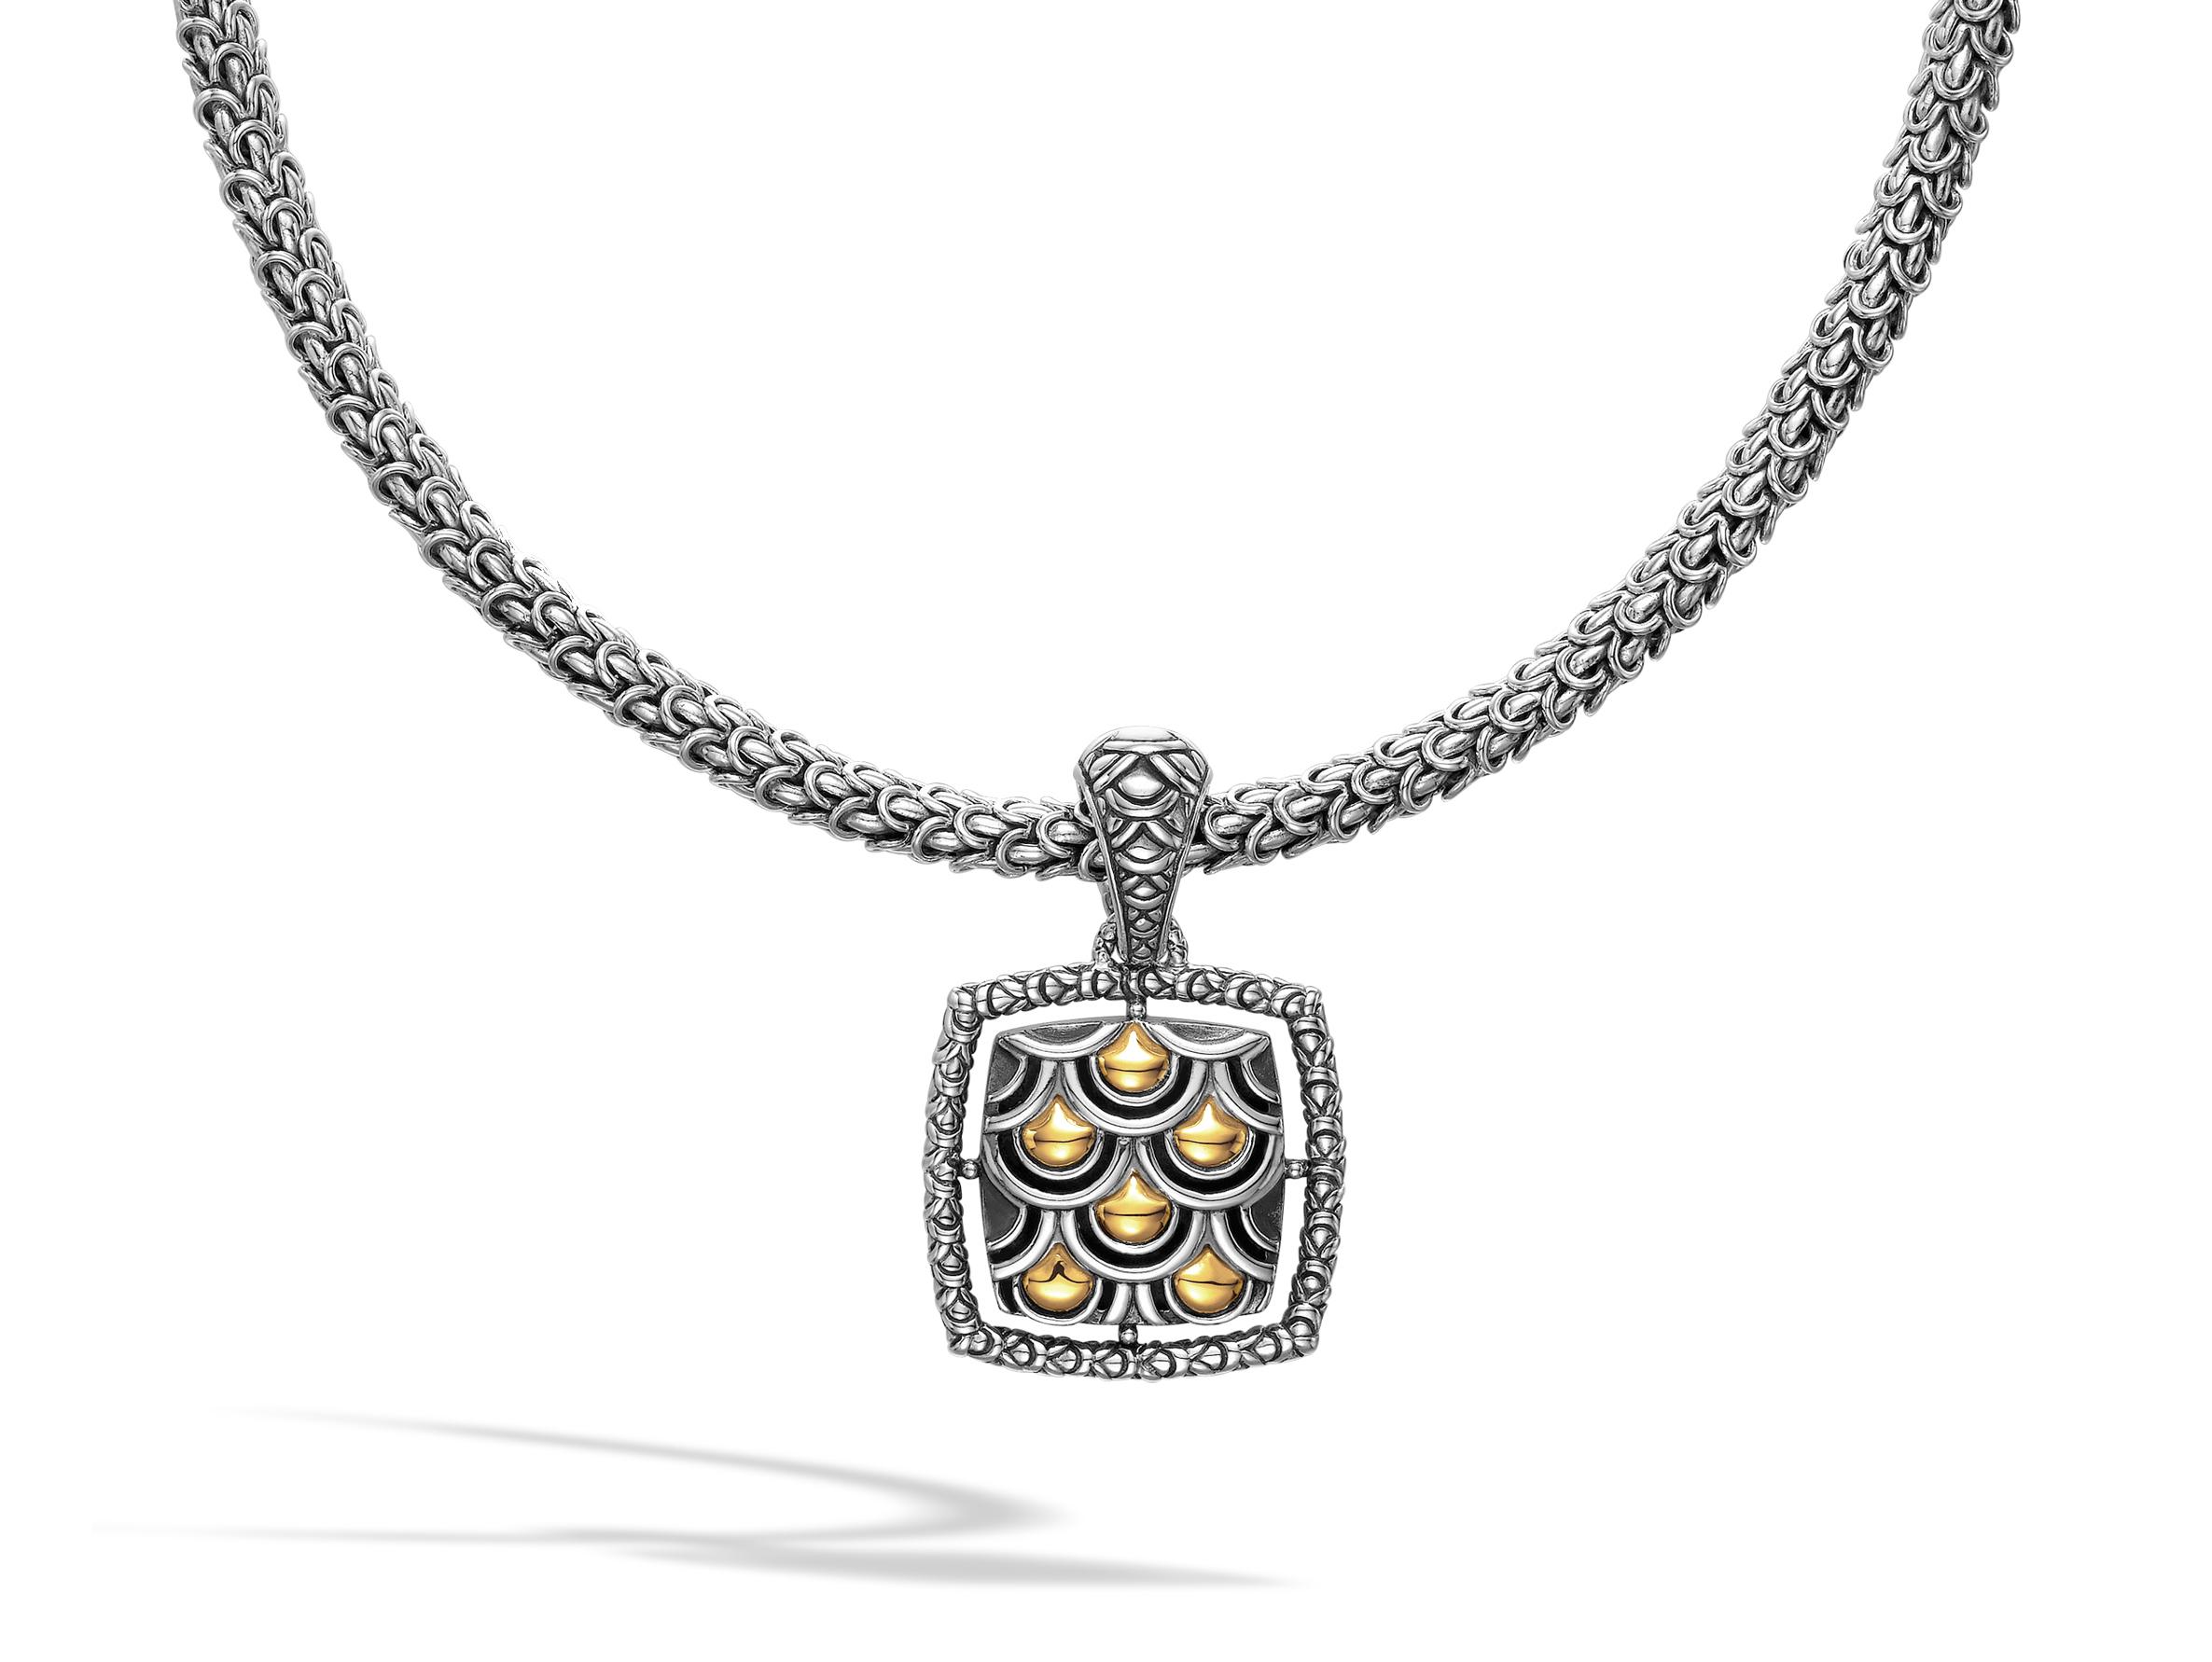 John hardy naga medium square pendant murphy jewelers aloadofball Image collections